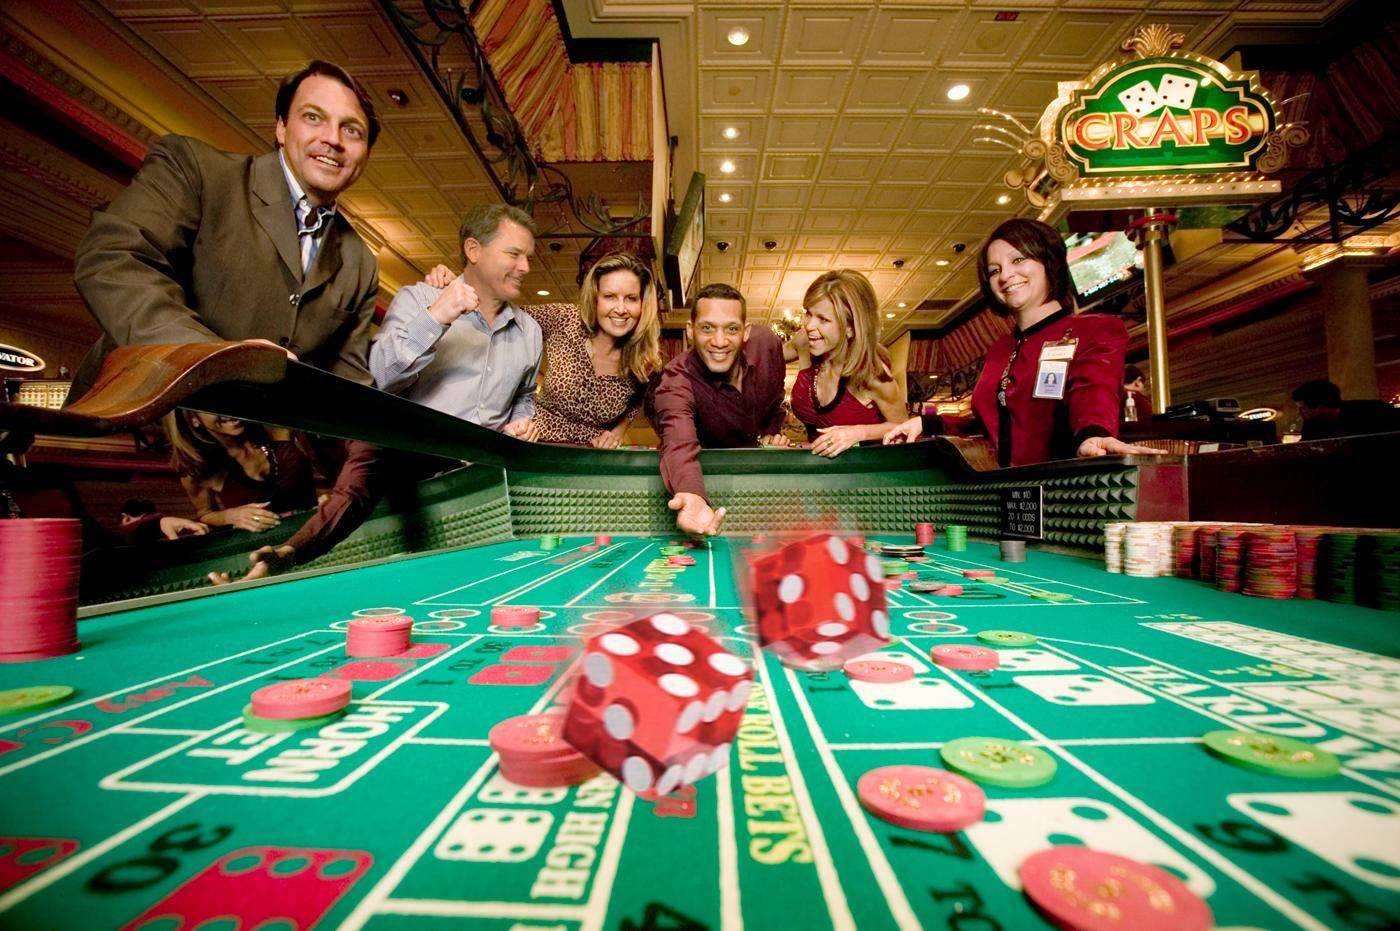 Casino casino gambling game online poker roulette red hak casino